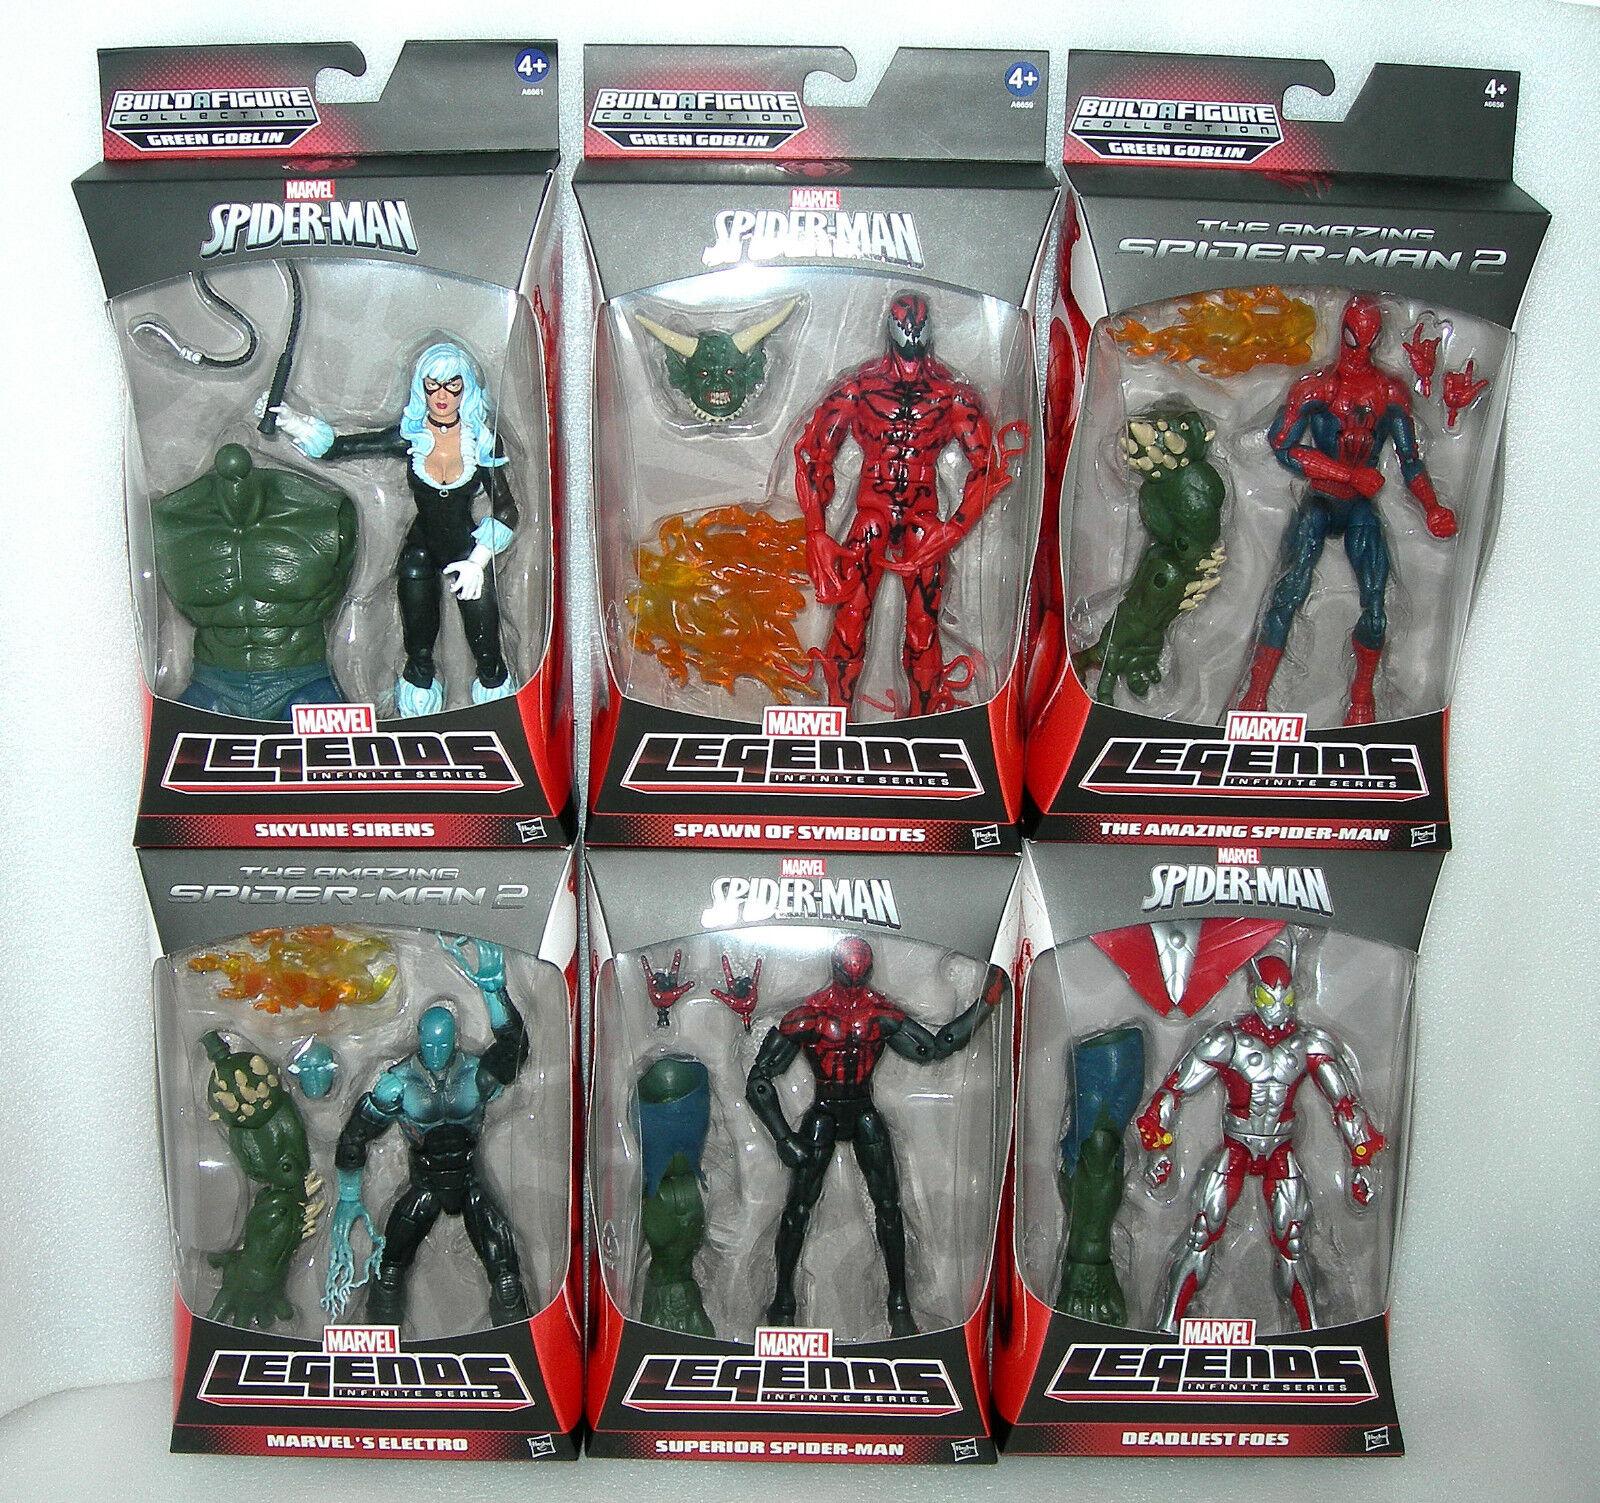 Marvel Amazing Spider-Man Legends 6  Séries infinies figures-ASST-Dod